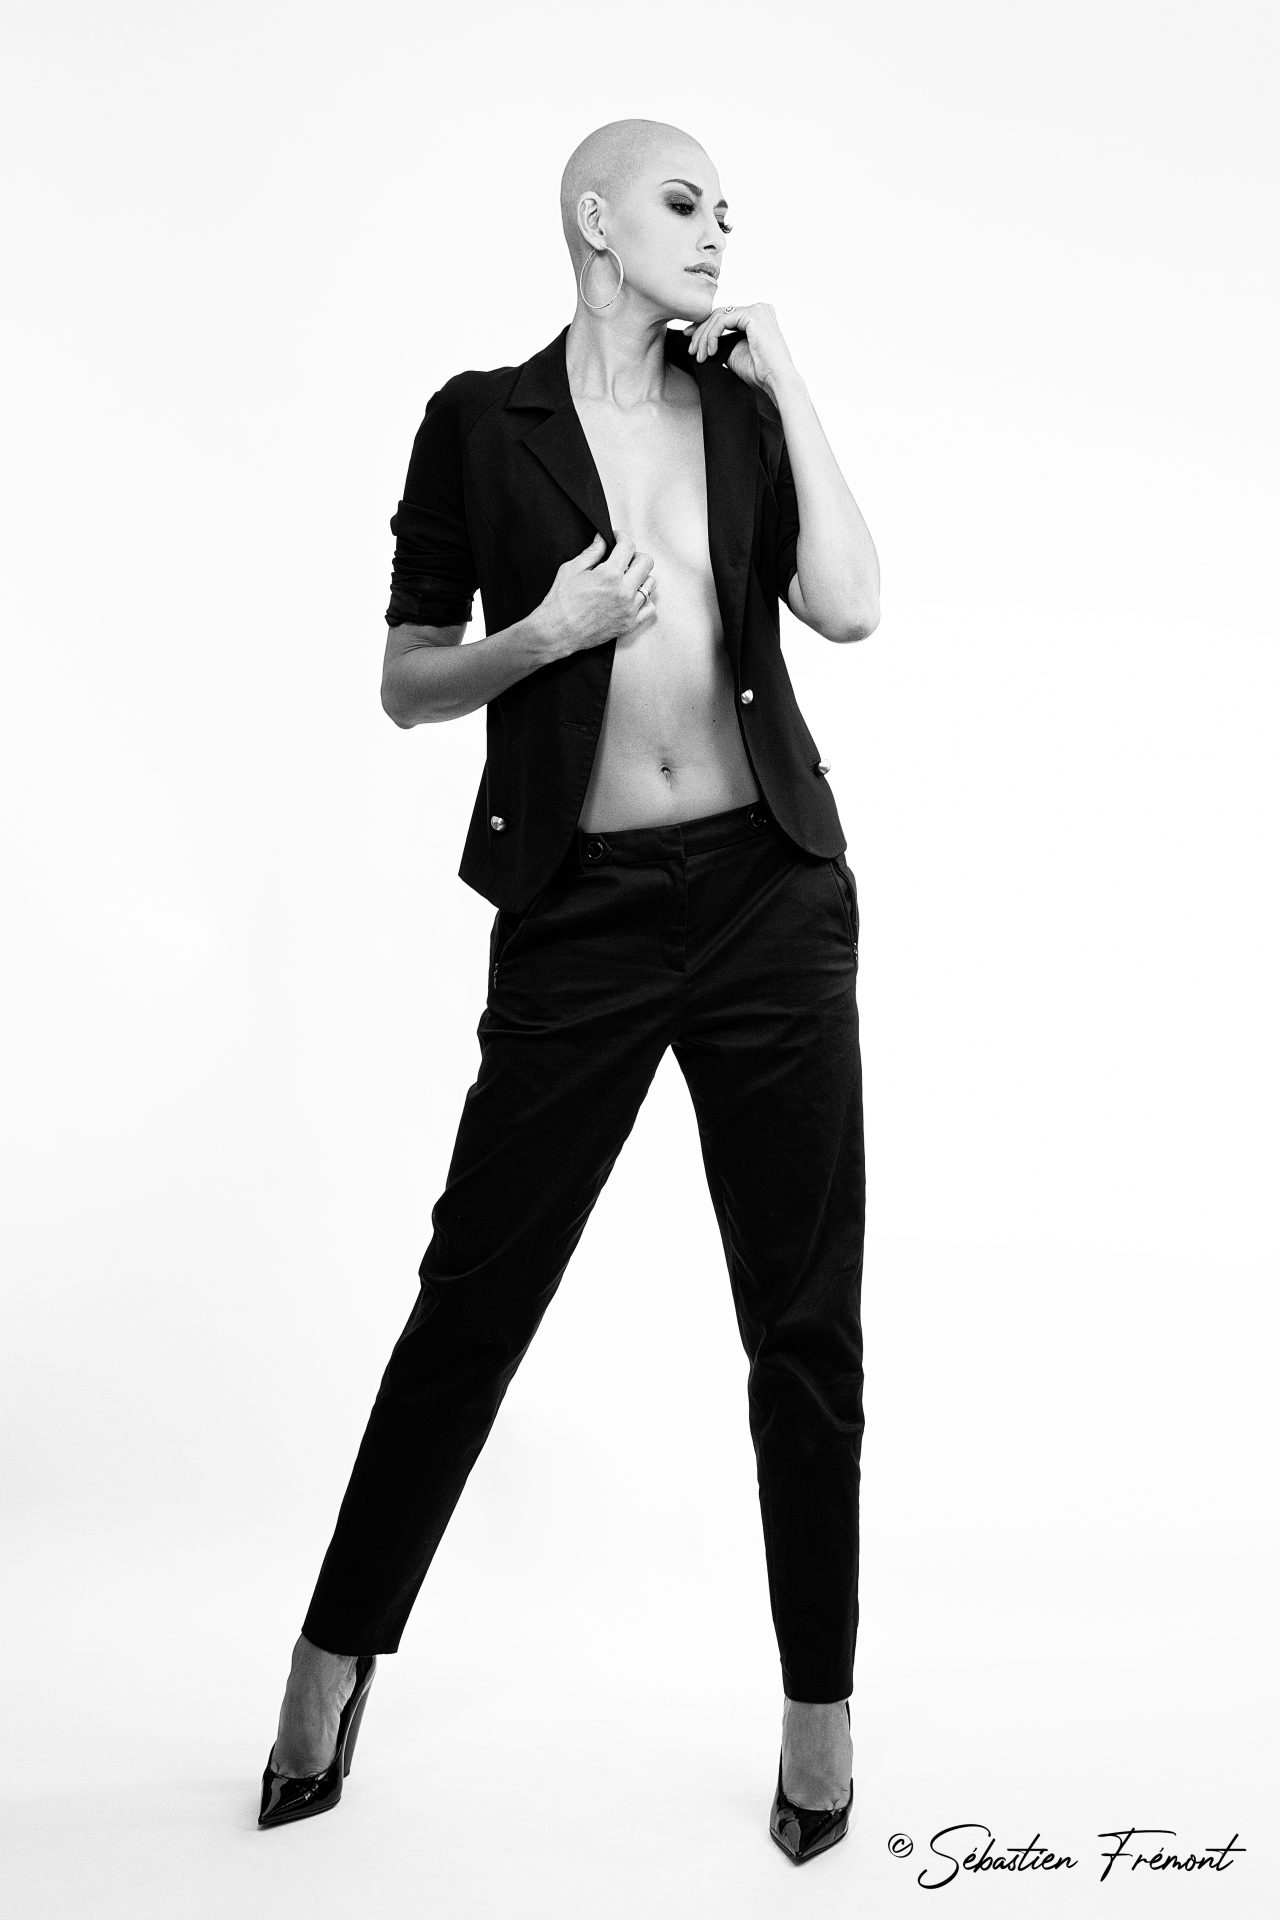 French Photographer Portrait Photography Abigail Lopez-Cruz / Fendi